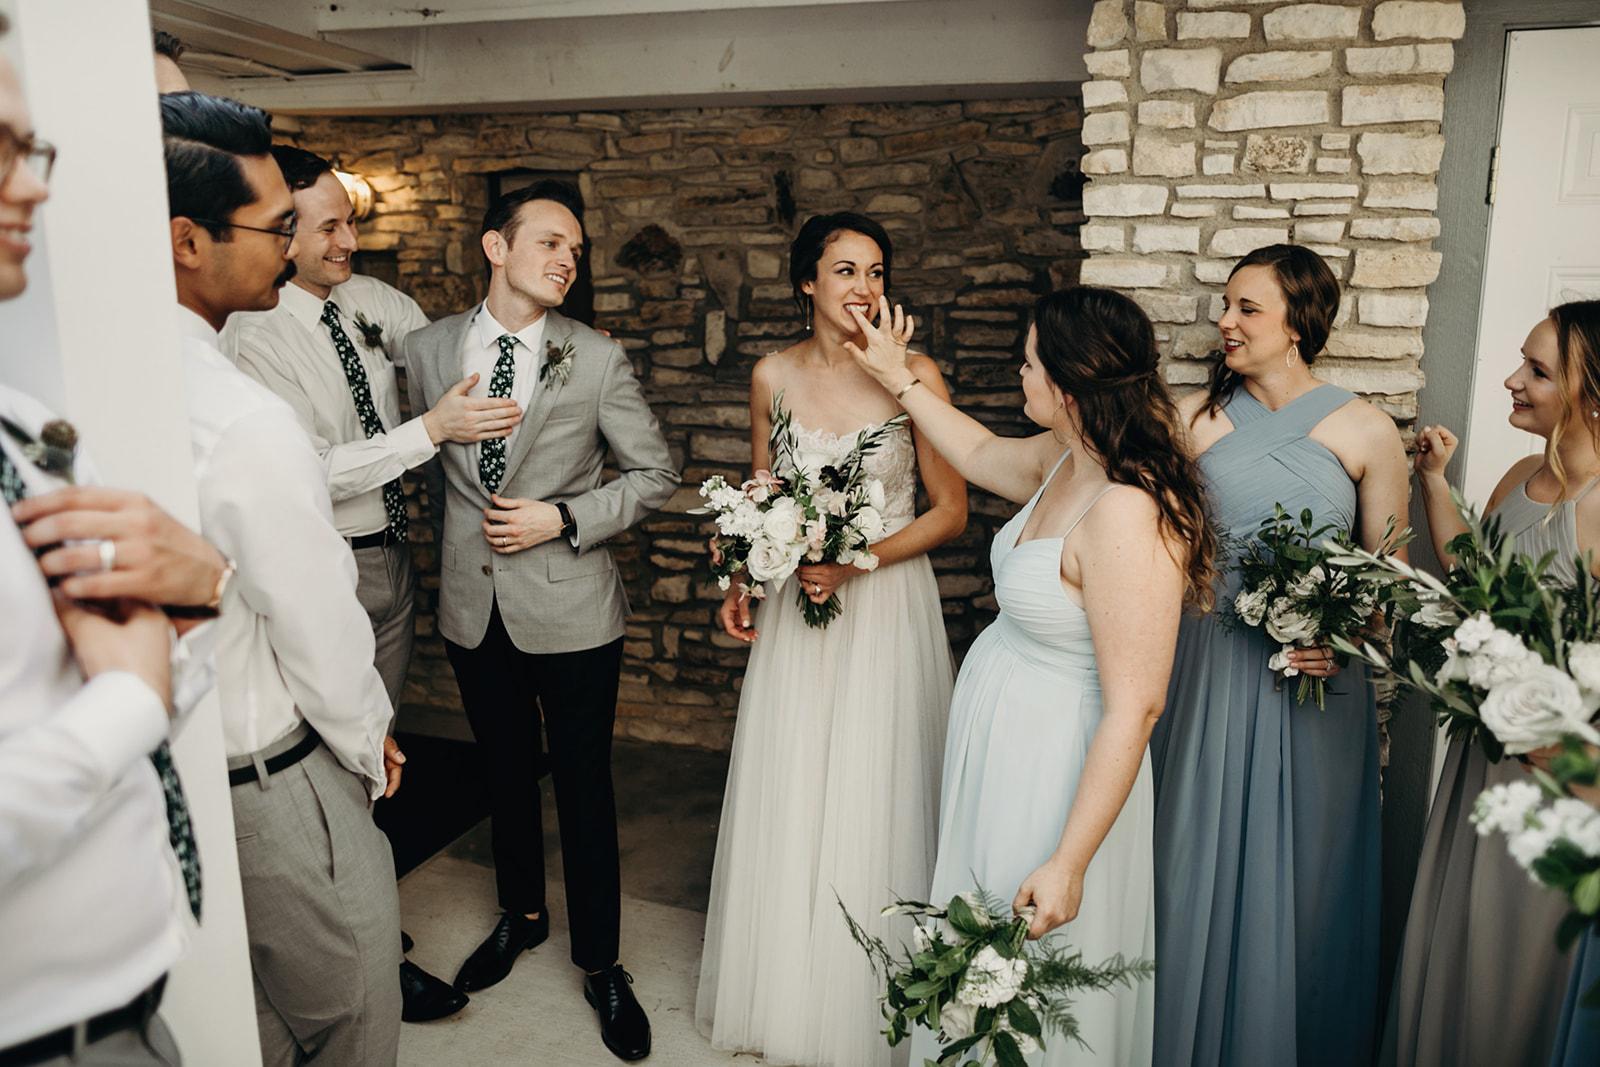 austin-wedding-lindsey-bryce-423.jpg